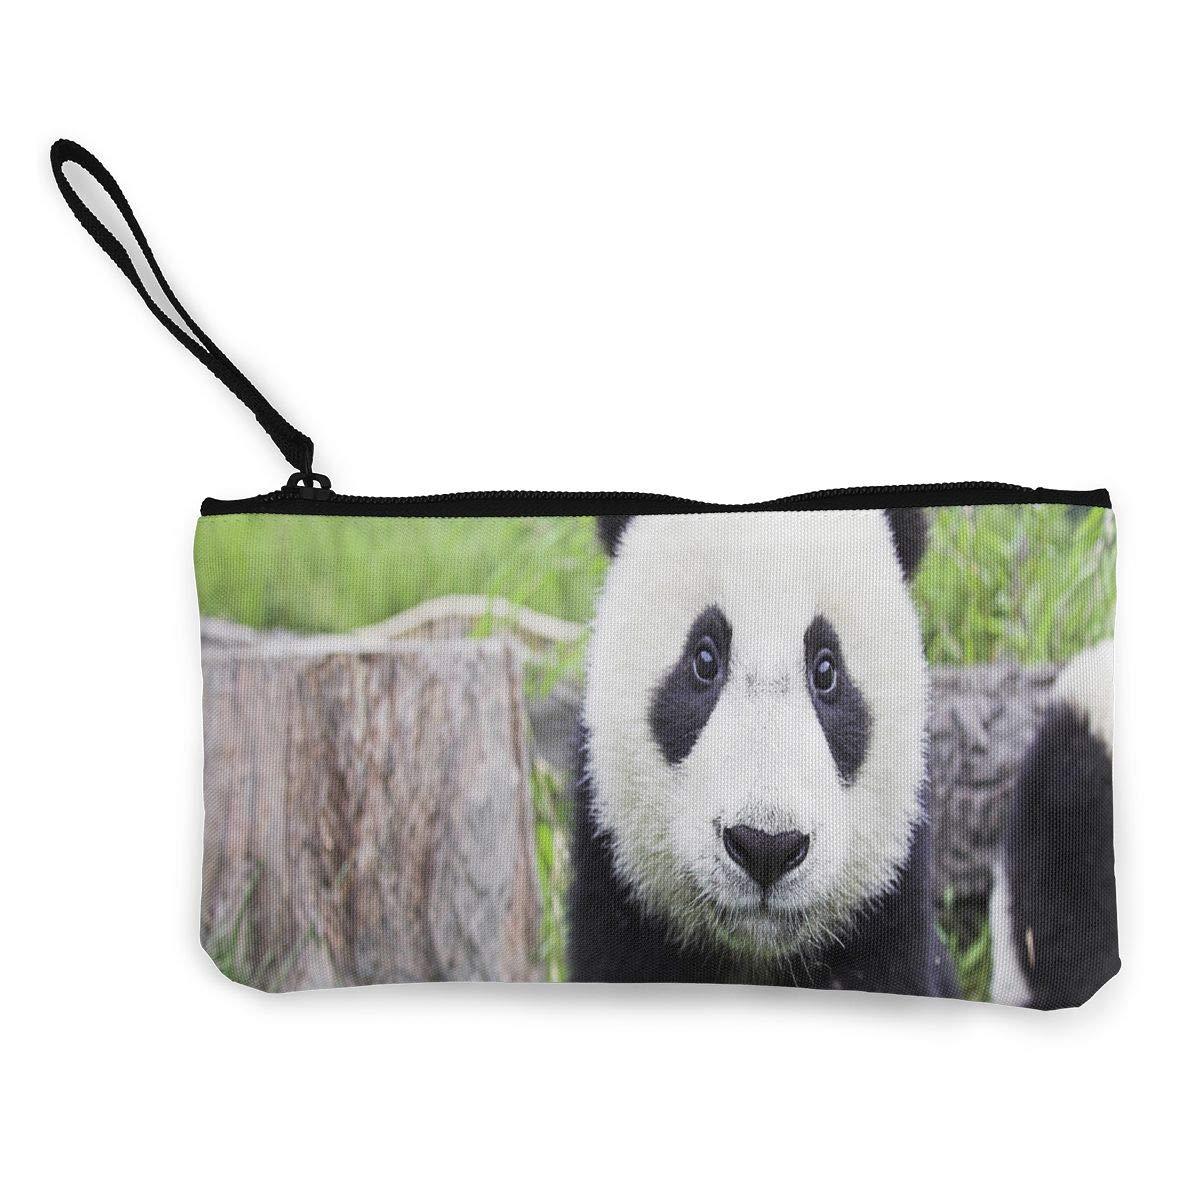 Coin Purse Cute Black And White Panda Ladies Zipper Canvas Purses TravelDesigner Bag